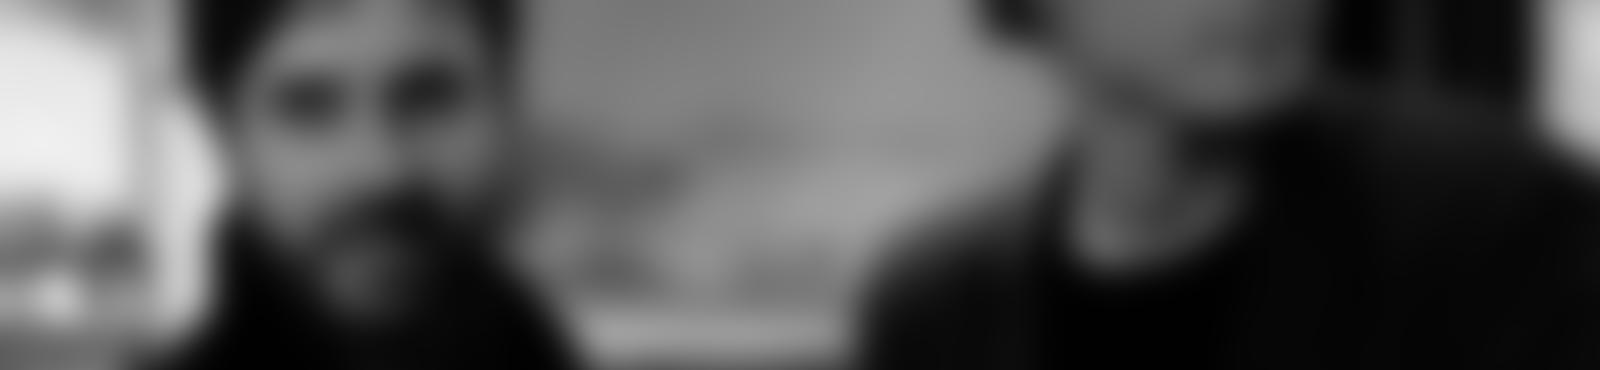 Blurred fe1cc305 47bc 4c35 9823 23fce14c40d7